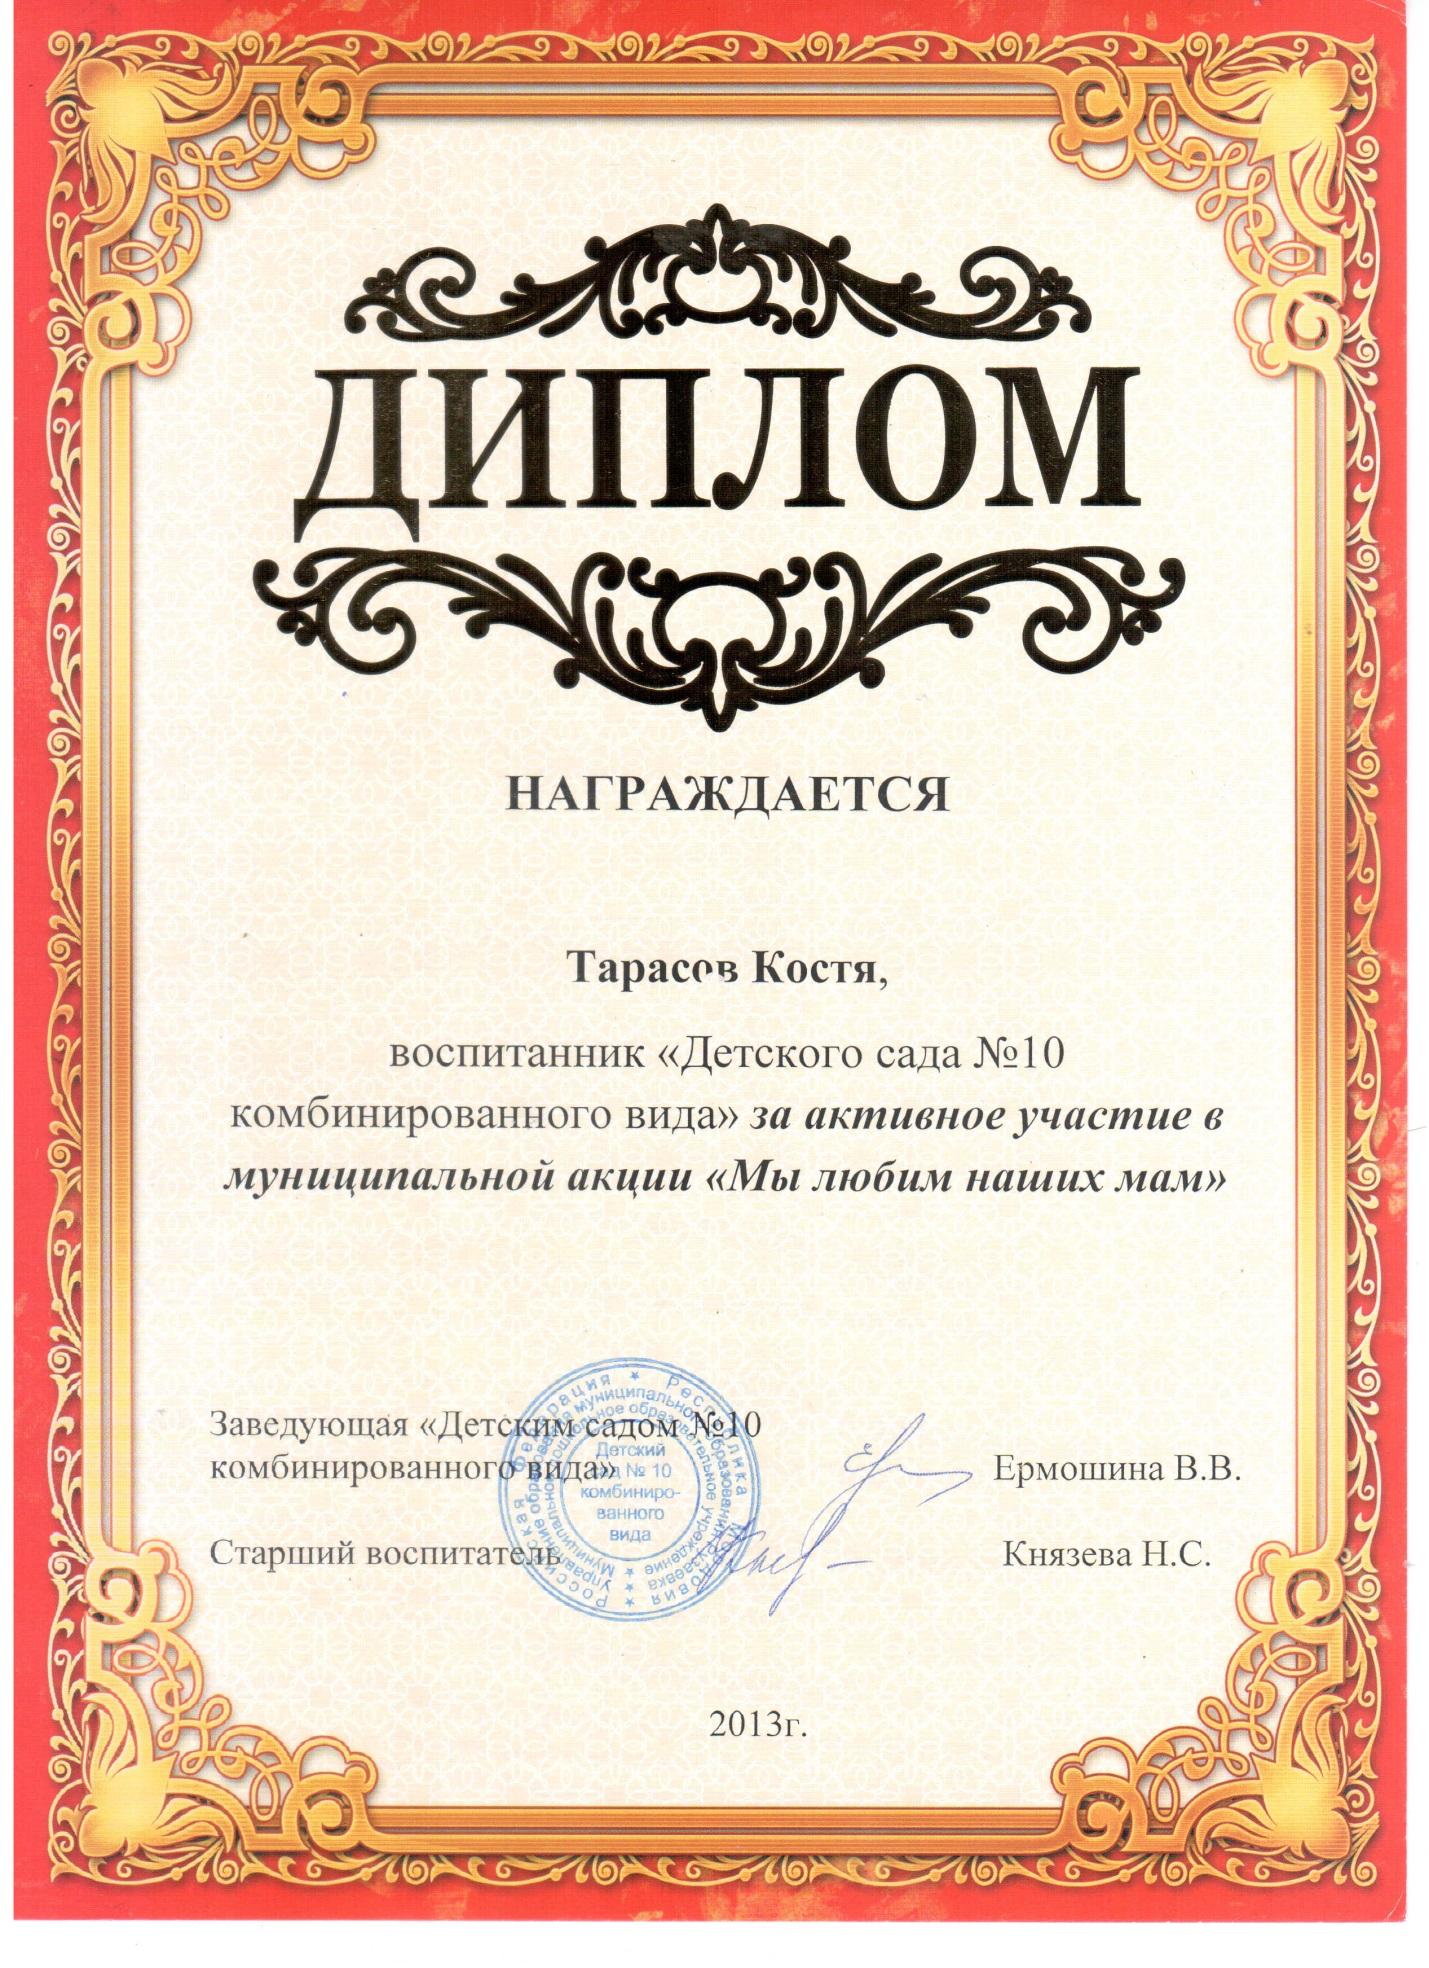 C:\Users\Гизар\Desktop\грамоты\.грамота тарасов_000.jpg